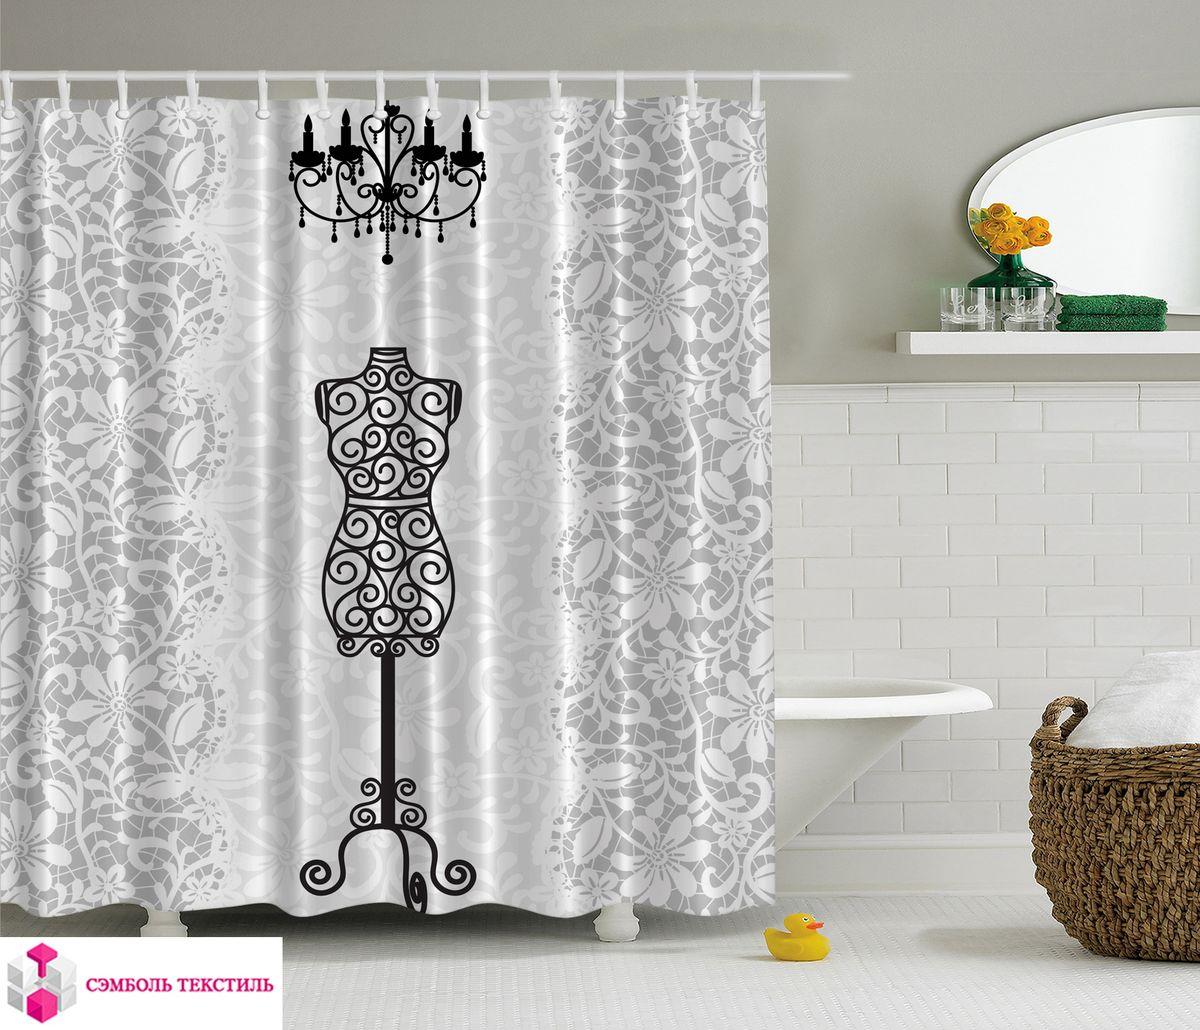 Штора для ванной комнаты Magic Lady Ателье, 180 х 200 см фотоштора для ванной утка принимает душ magic lady 180 х 200 см